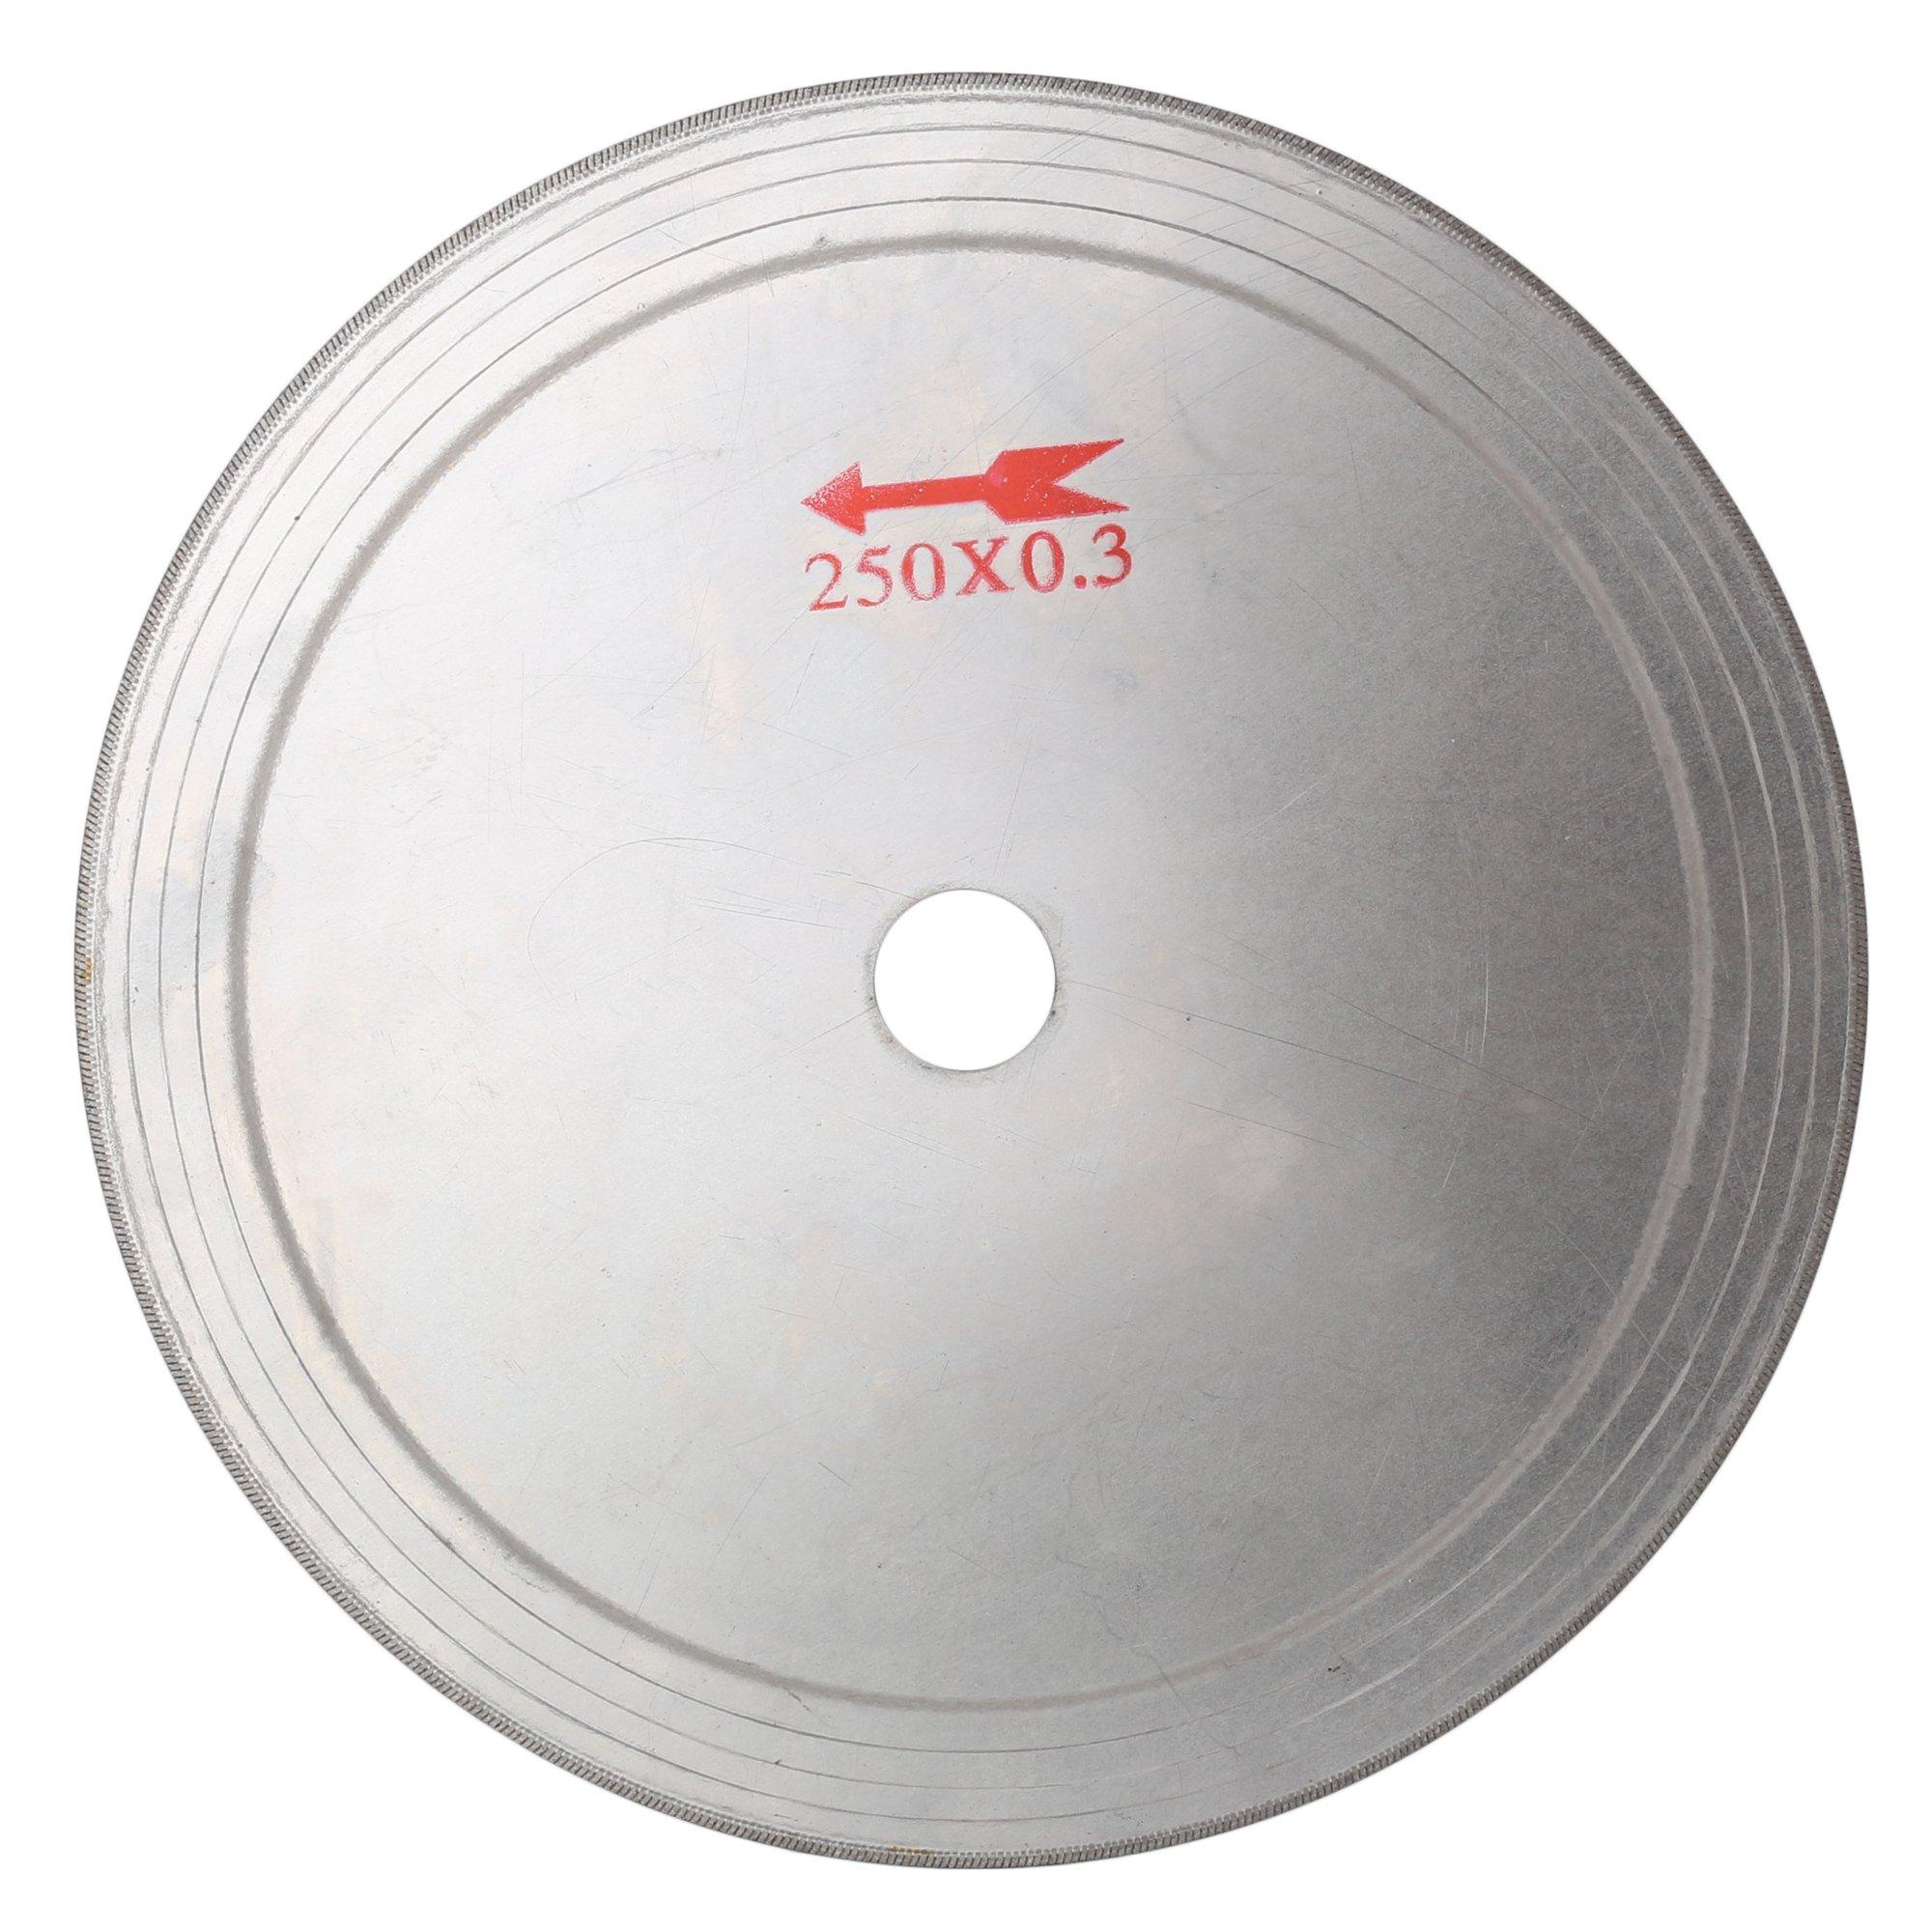 ILOVETOOL 10 inch Thin Edge Wet Diamond Blade Disc Lapidary Saw for Stone Tools